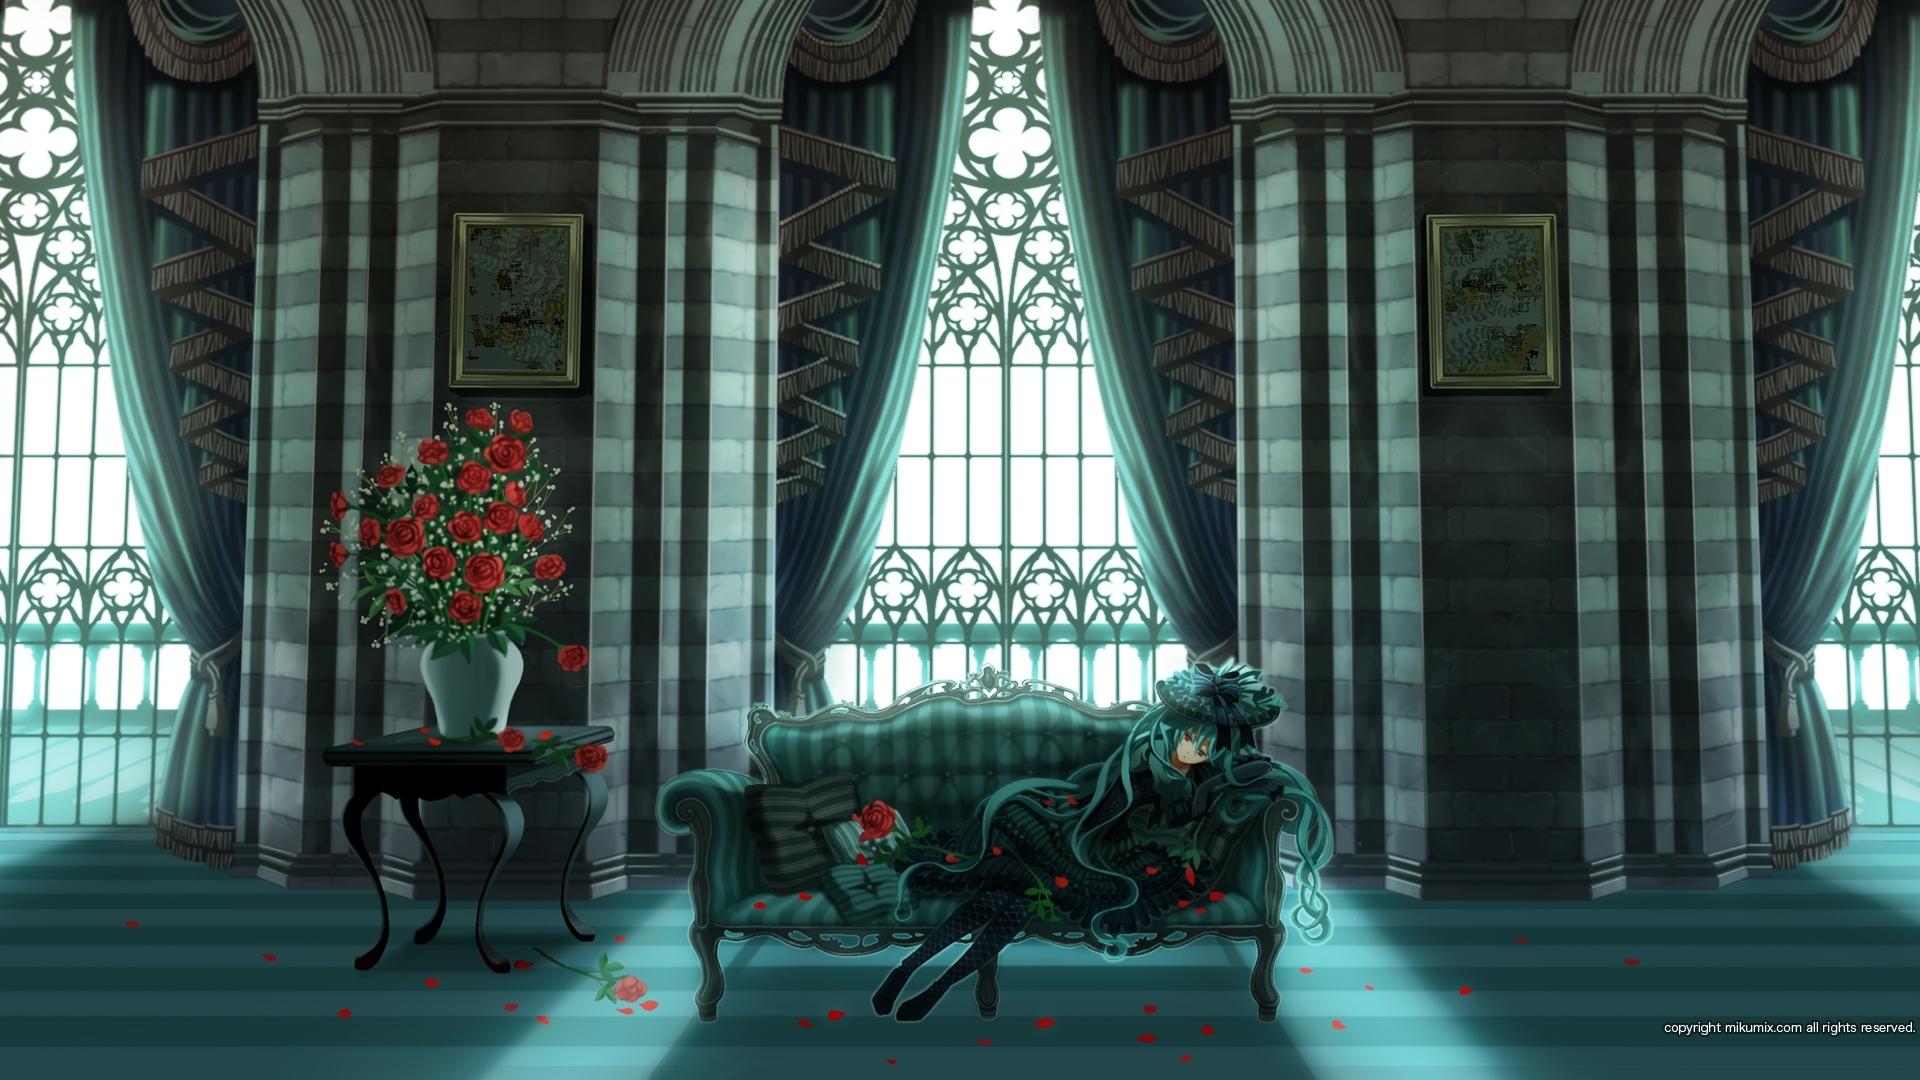 1920x1080-hatsune-miku-dress-flowers-vase-room-wallpaper-wpc9001011